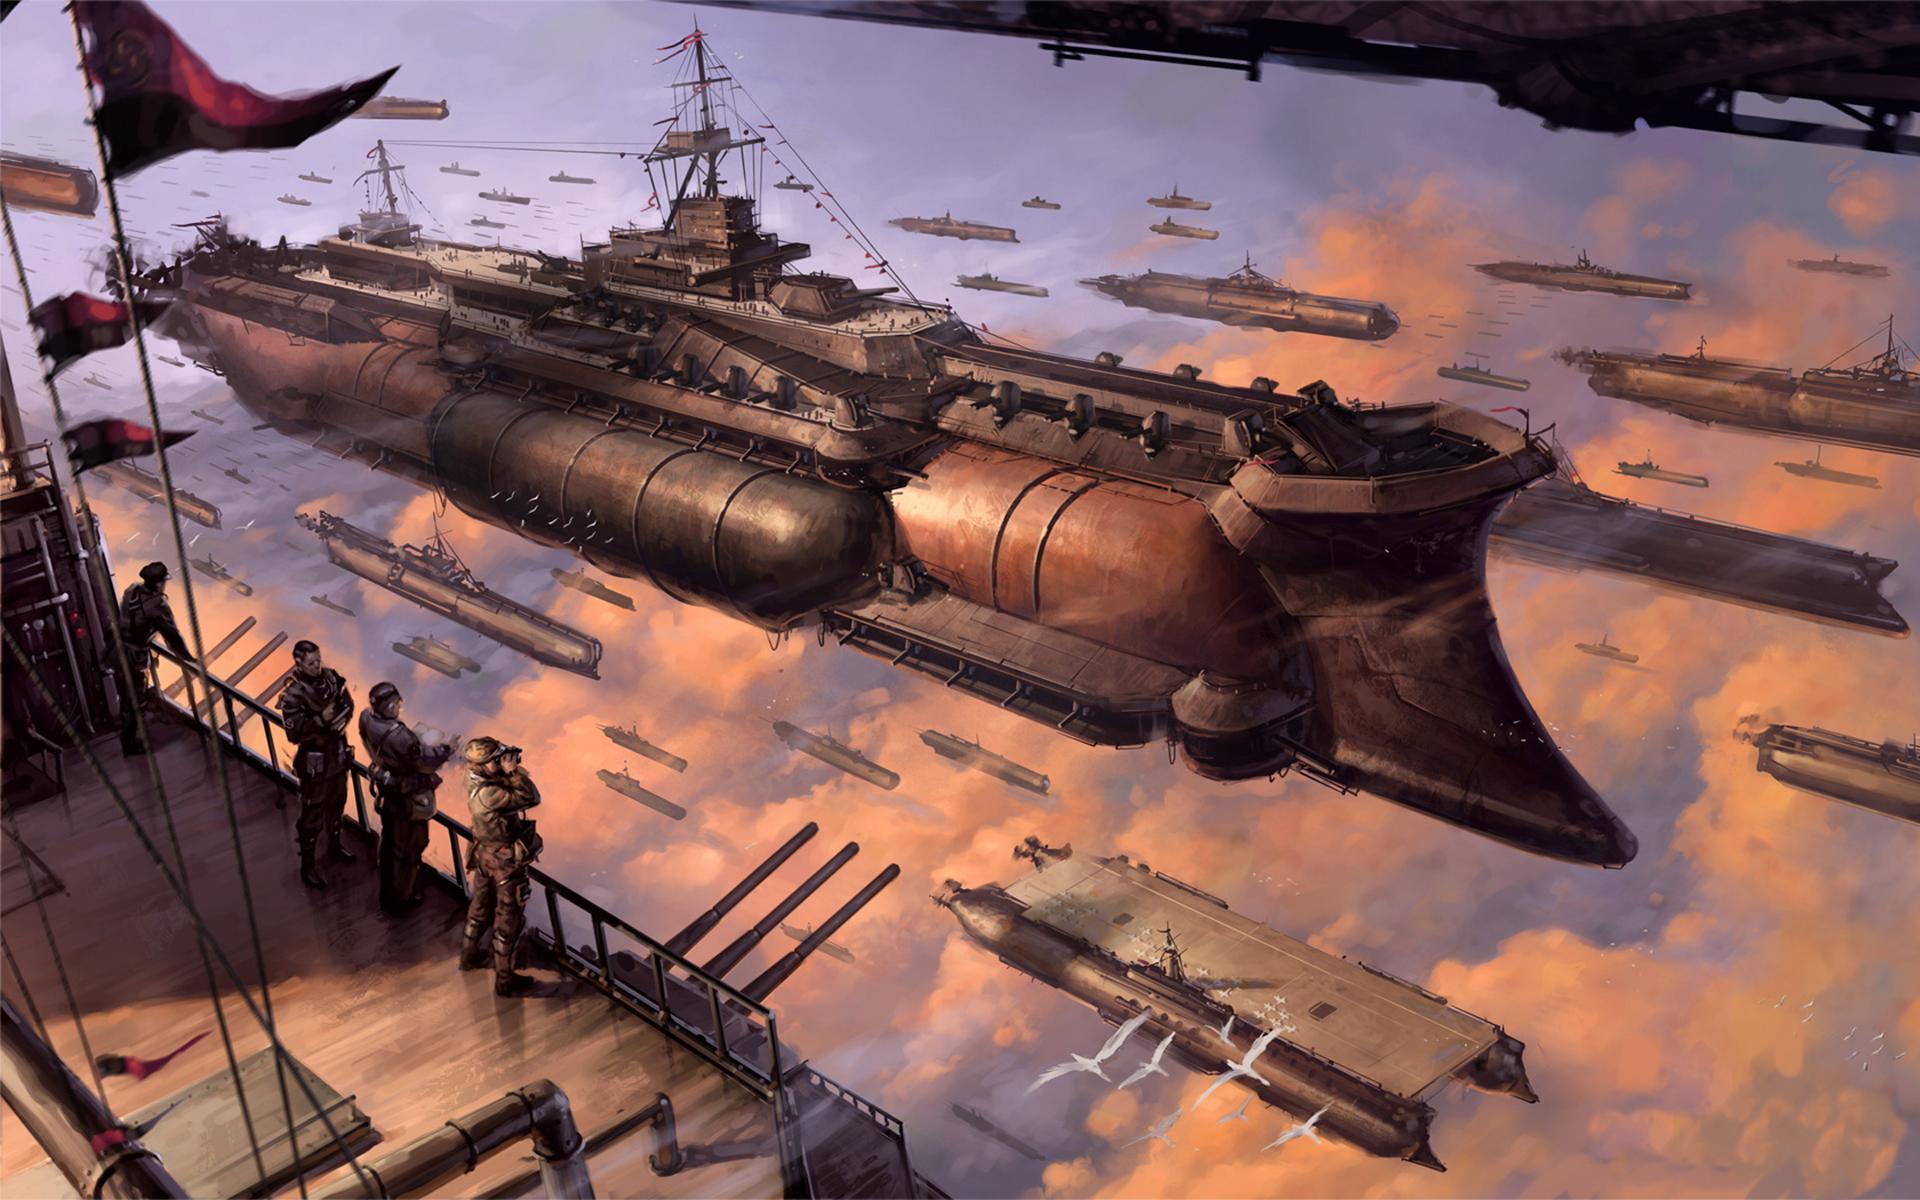 Sci Fi   Steampunk Battleship Last Exile Wallpaper 1920x1200